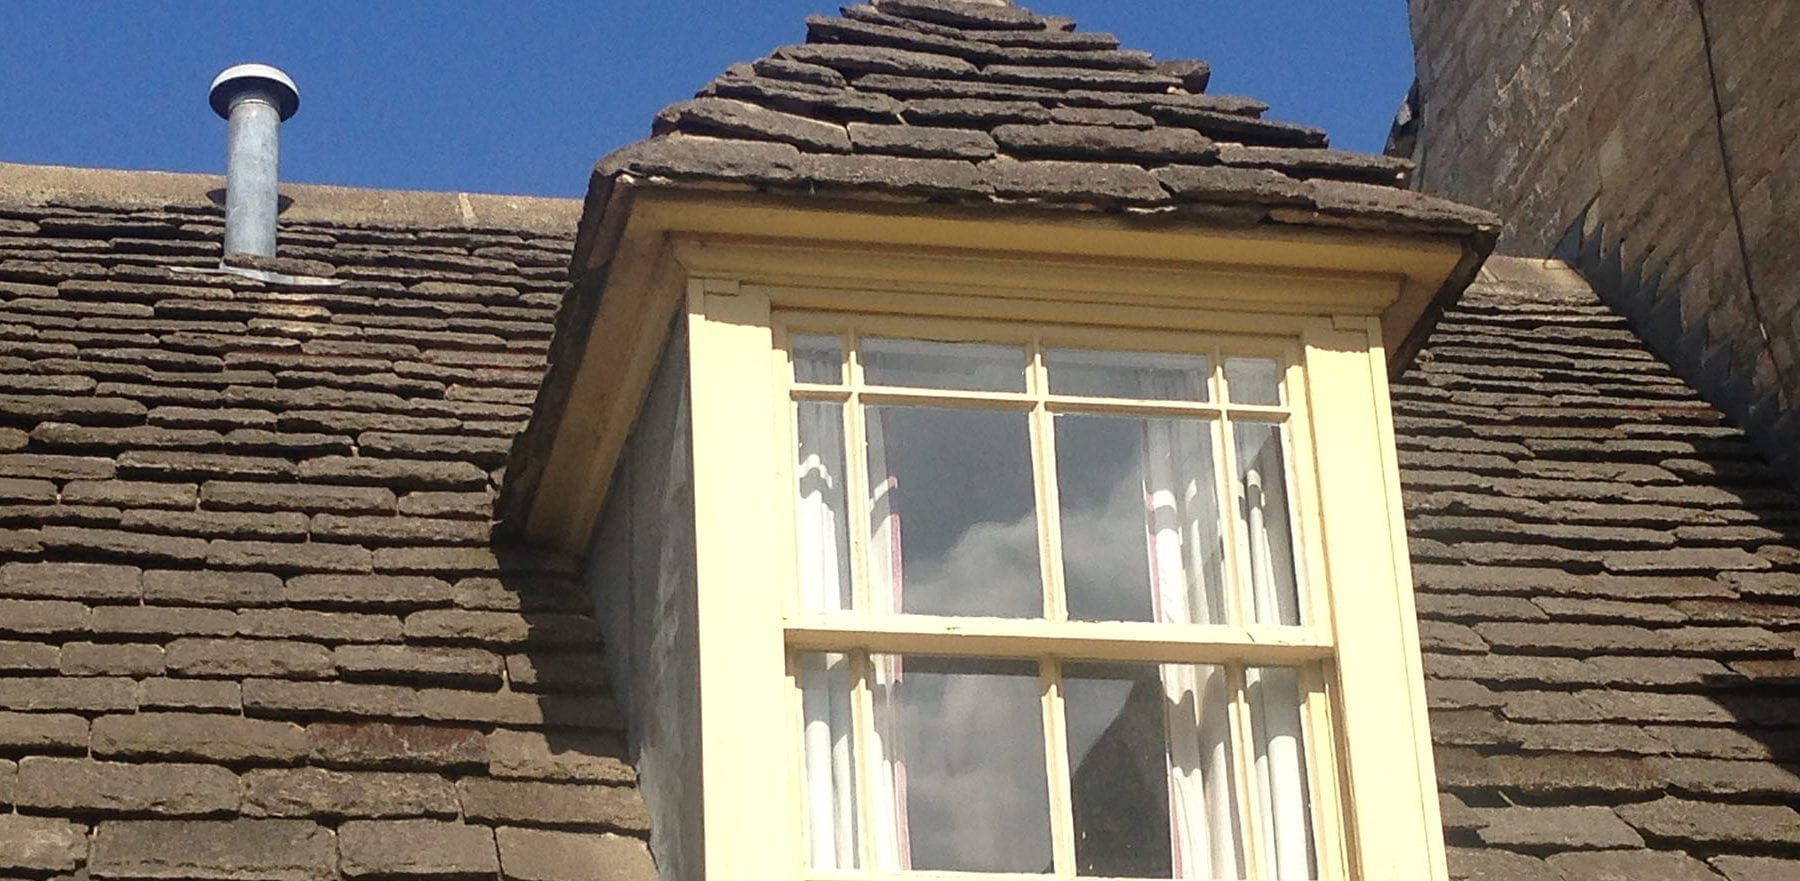 Lifestiles - Natural Stone Aged Roof Tiles - Oxford University, England 2